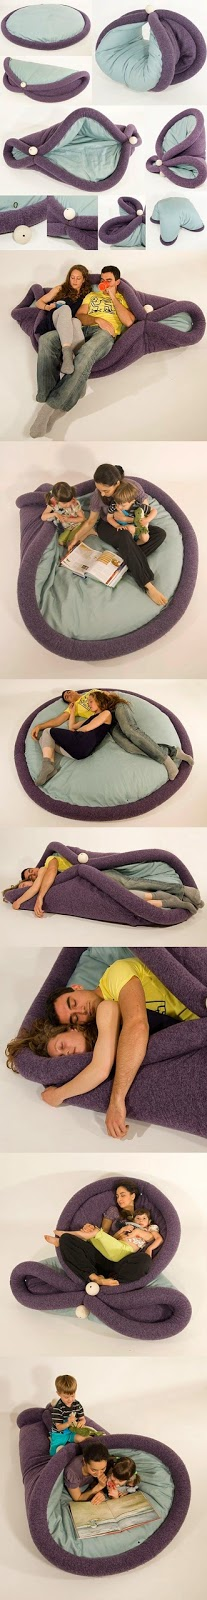 Convertible Sofa - Convertible Furniture